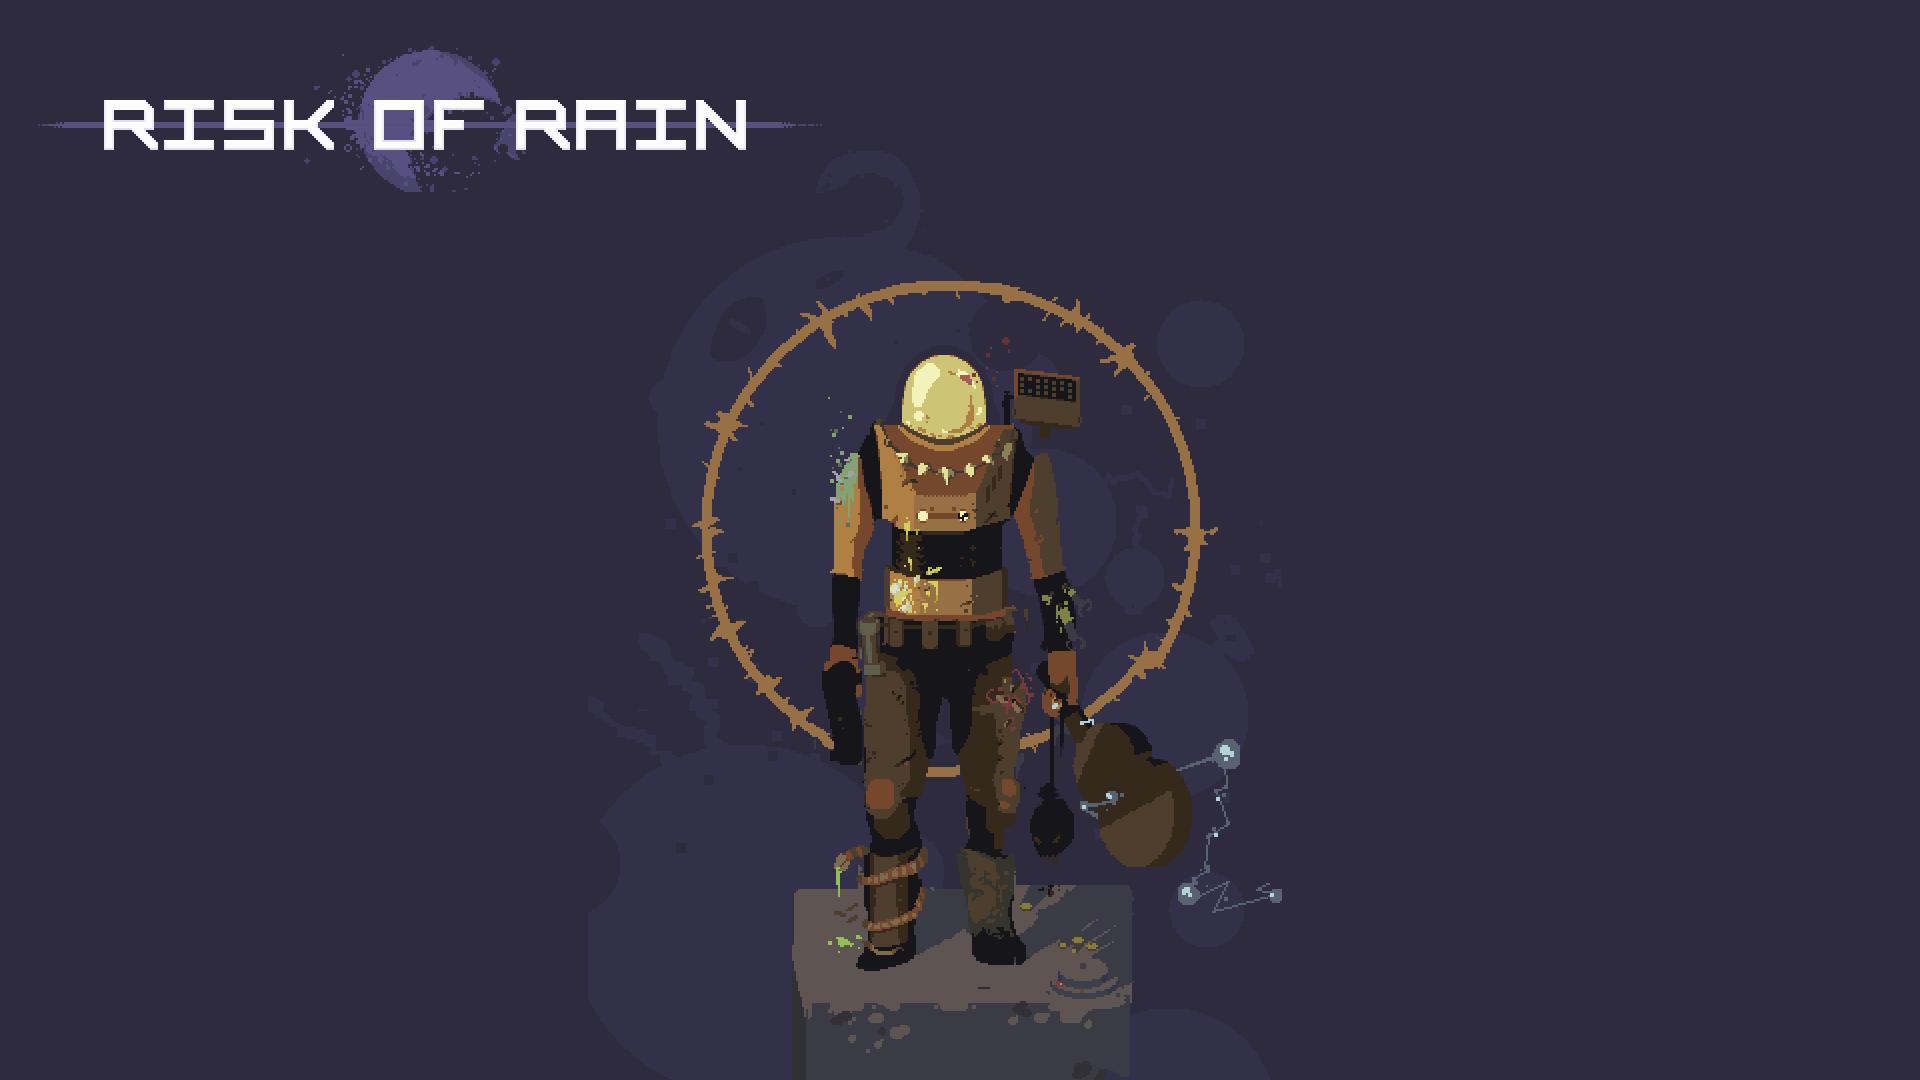 Risk of Rain, glavna ilustracija